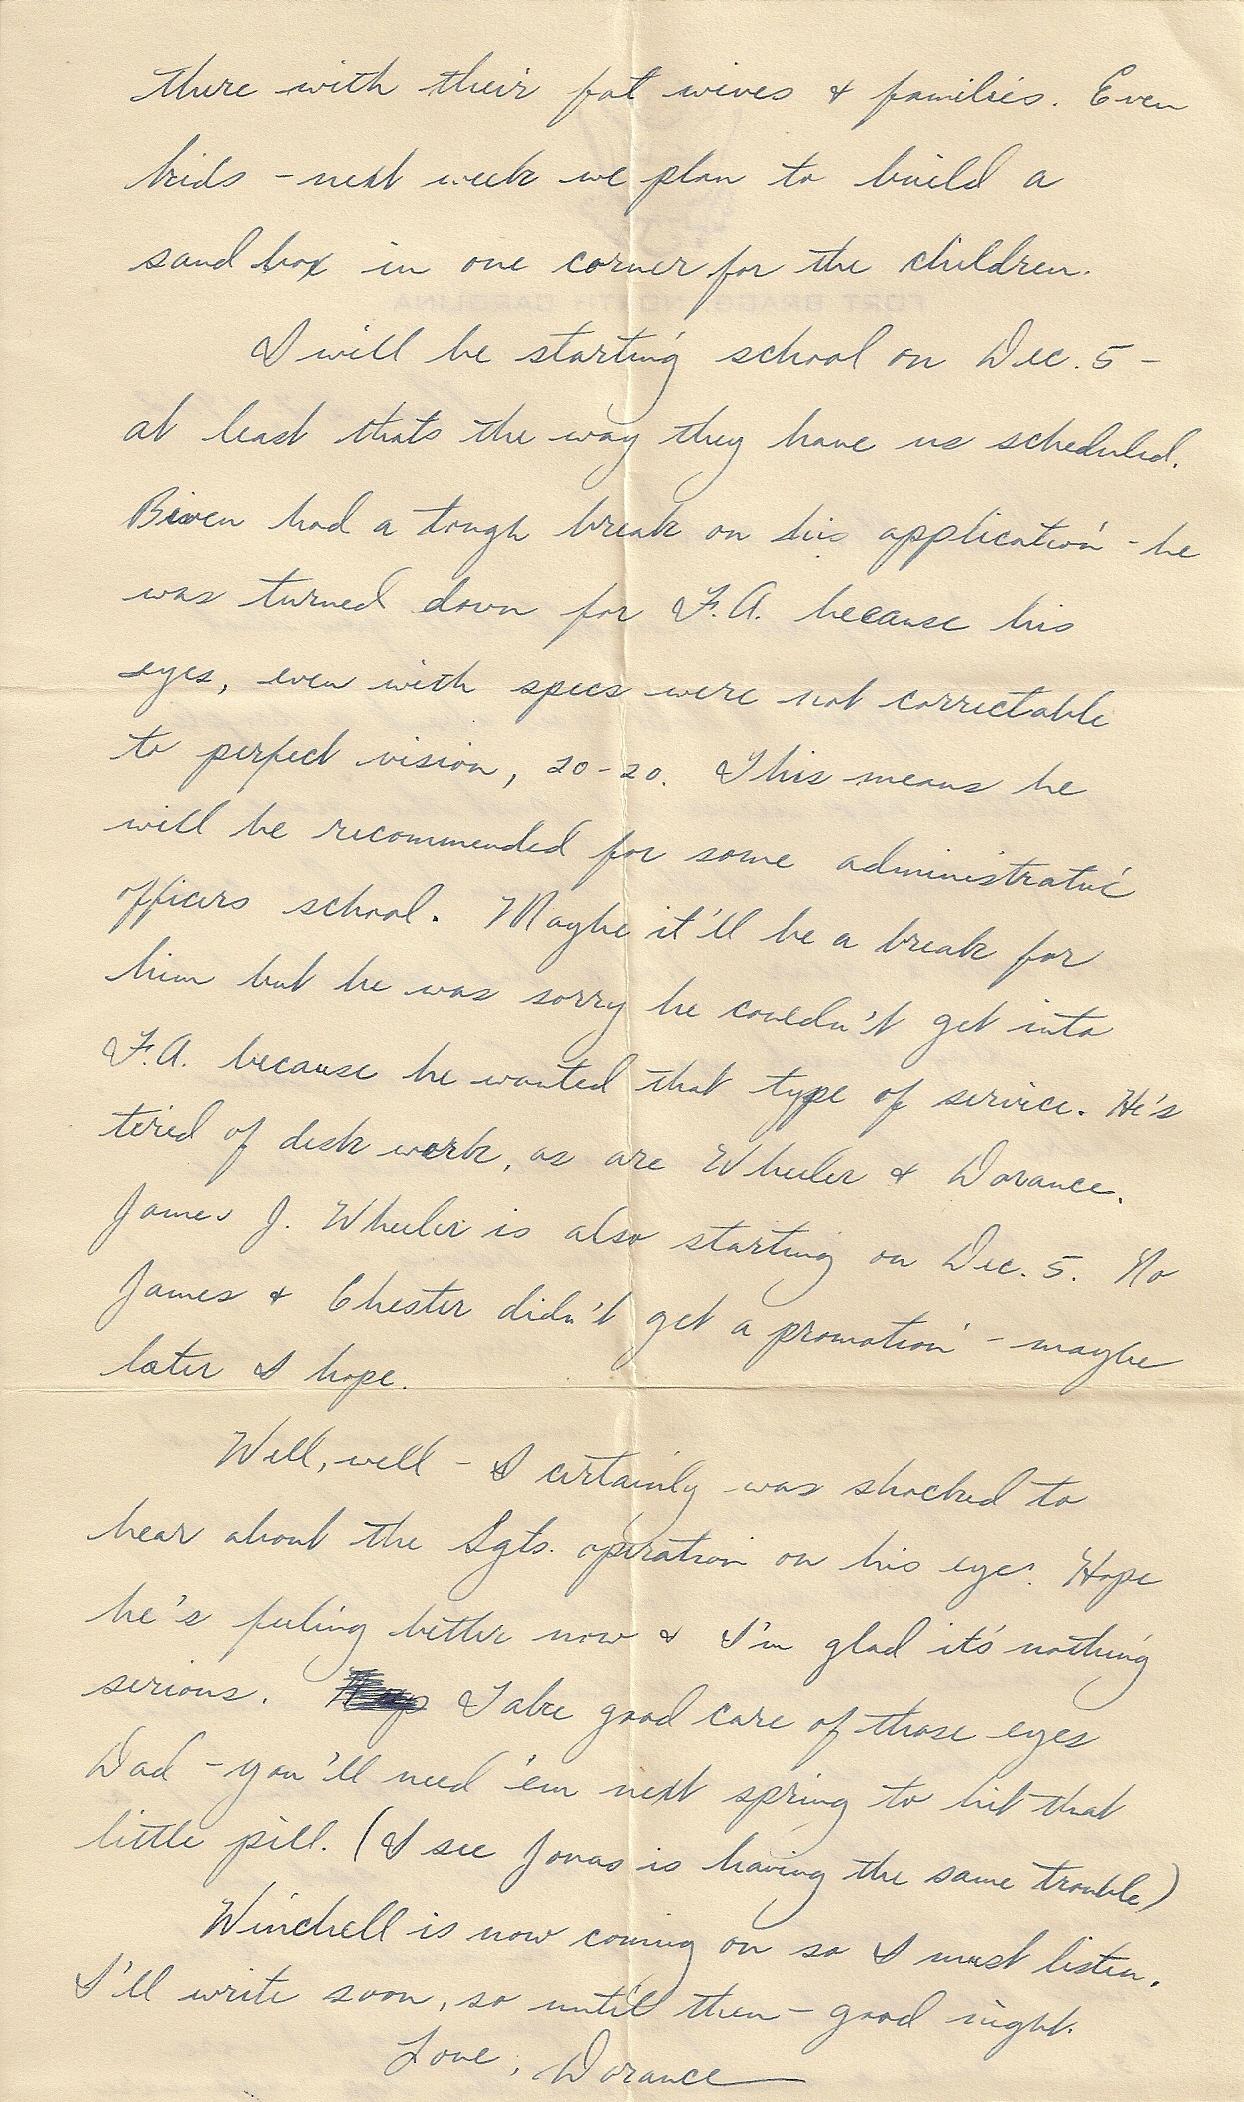 11.22.1942c.jpg